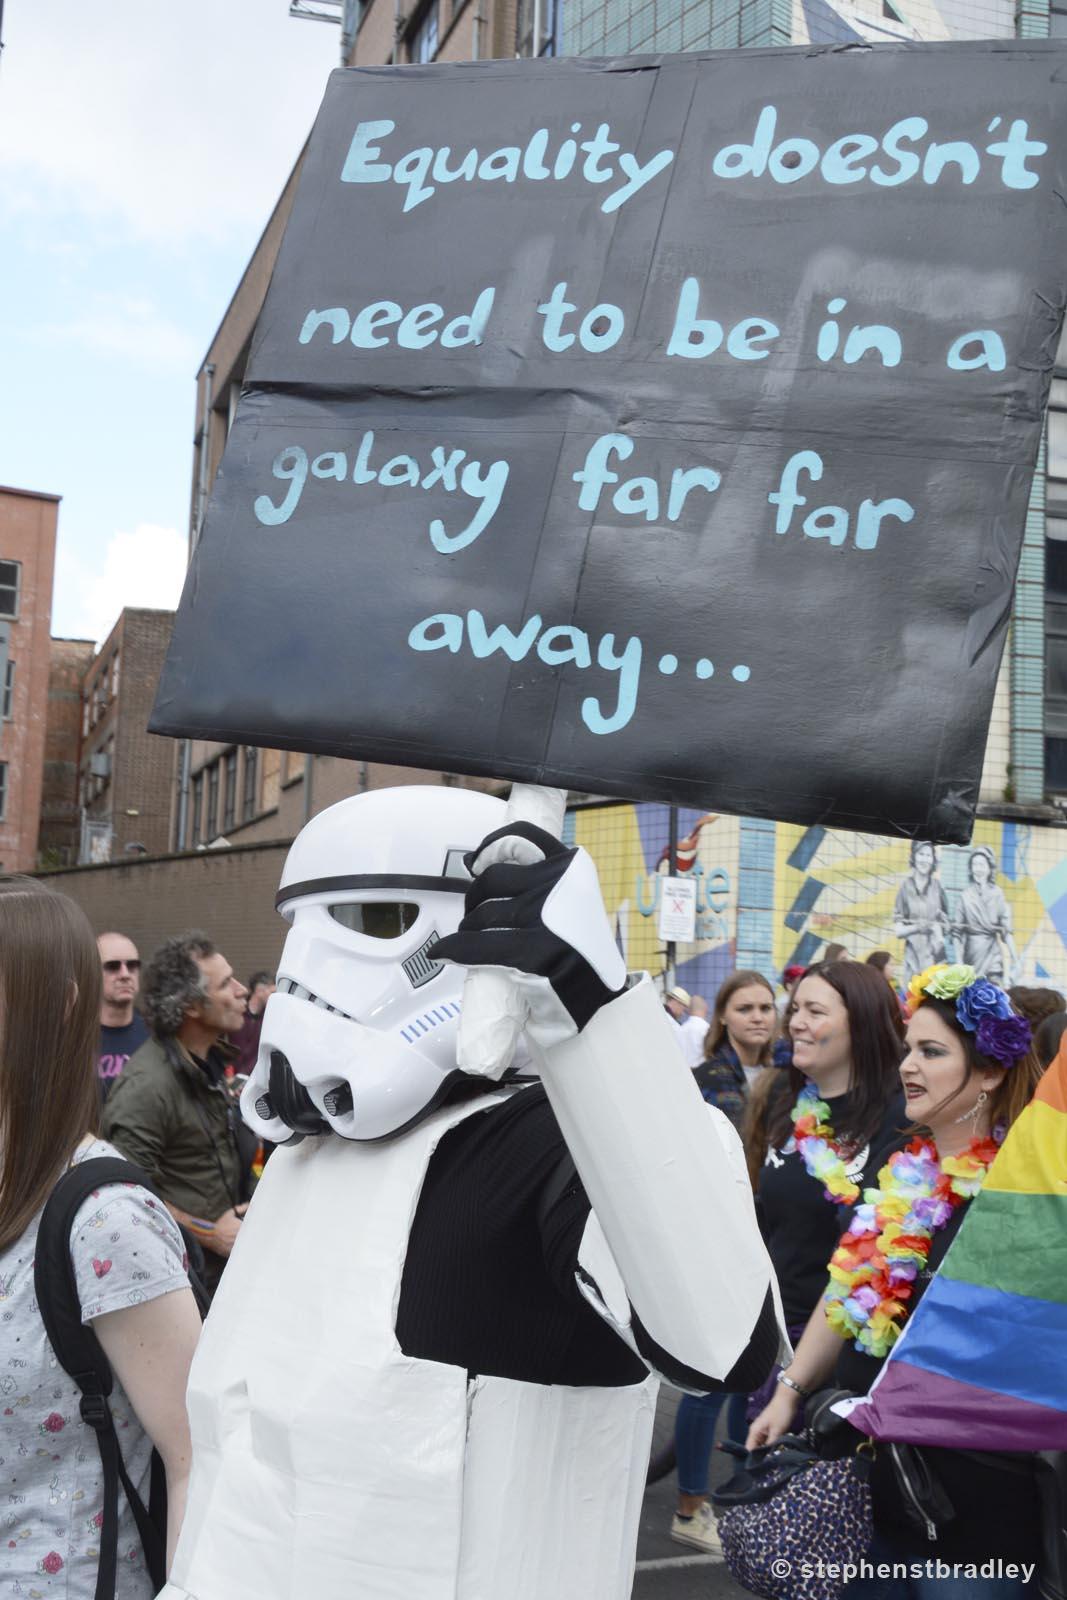 Editorial photographer Dublin portfolio photo 8545 of Belfast Pride Parade by Stephen S T Bradley